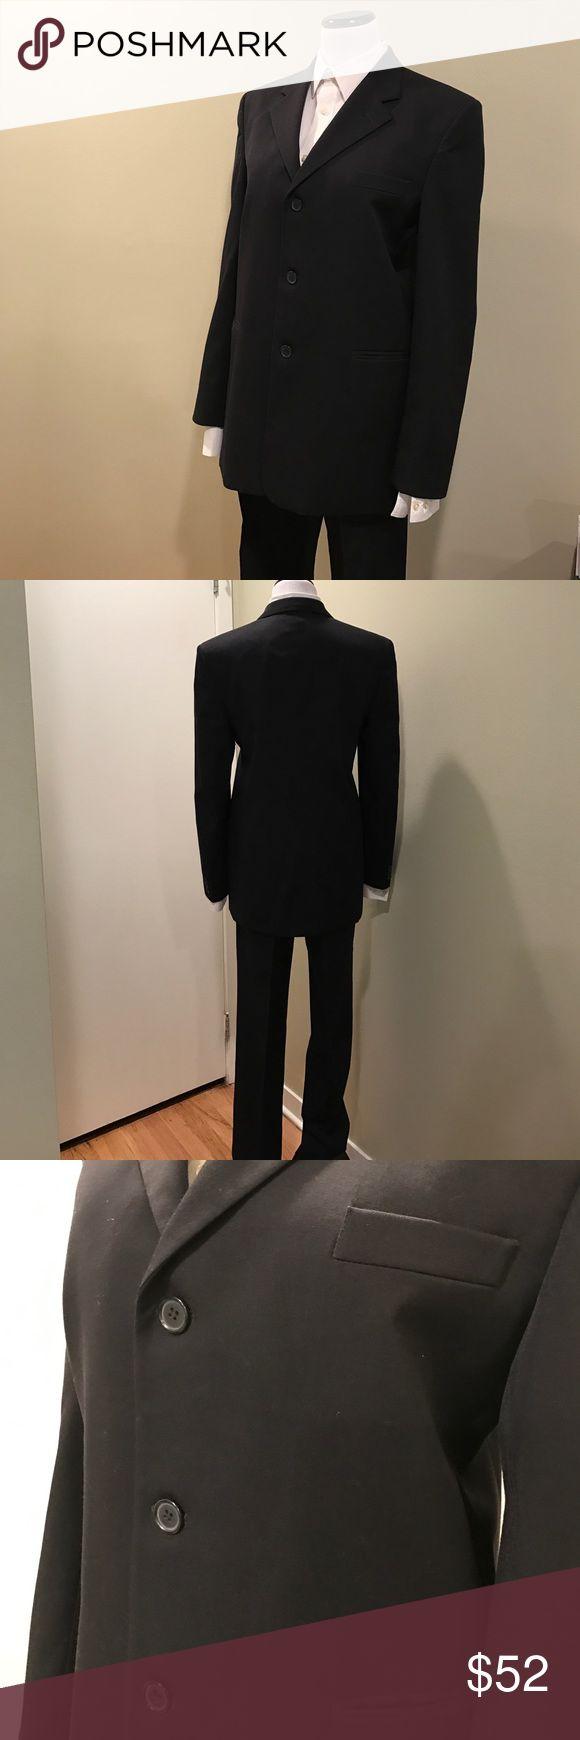 Young men's  suit size20 Young men's  black suit size20R in excellent condition worn ones Nordstrom Suits & Blazers Suits